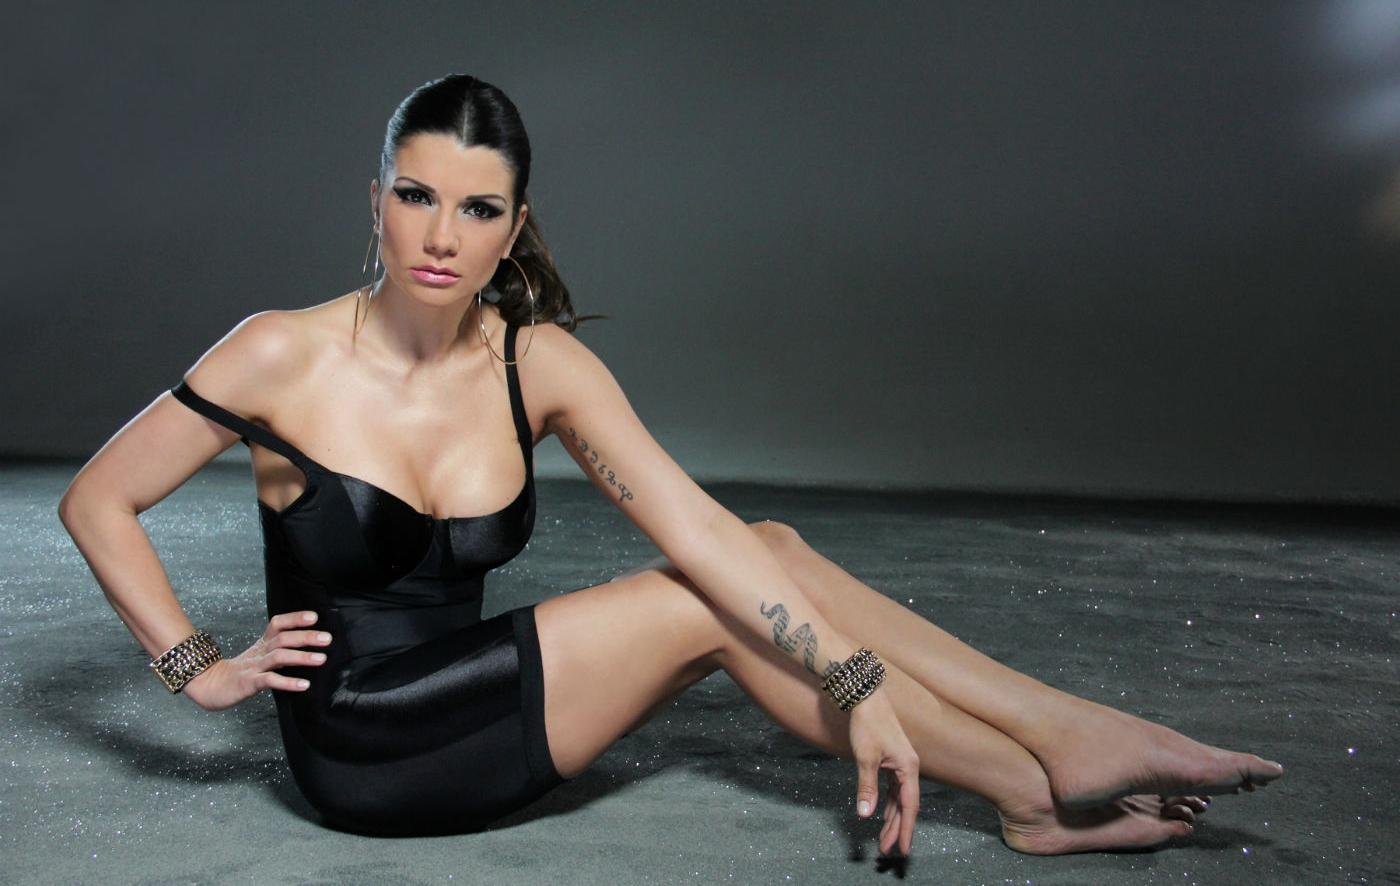 Слава певеца секс, Голая актриса и певица Слава - порно фото и секс 3 фотография